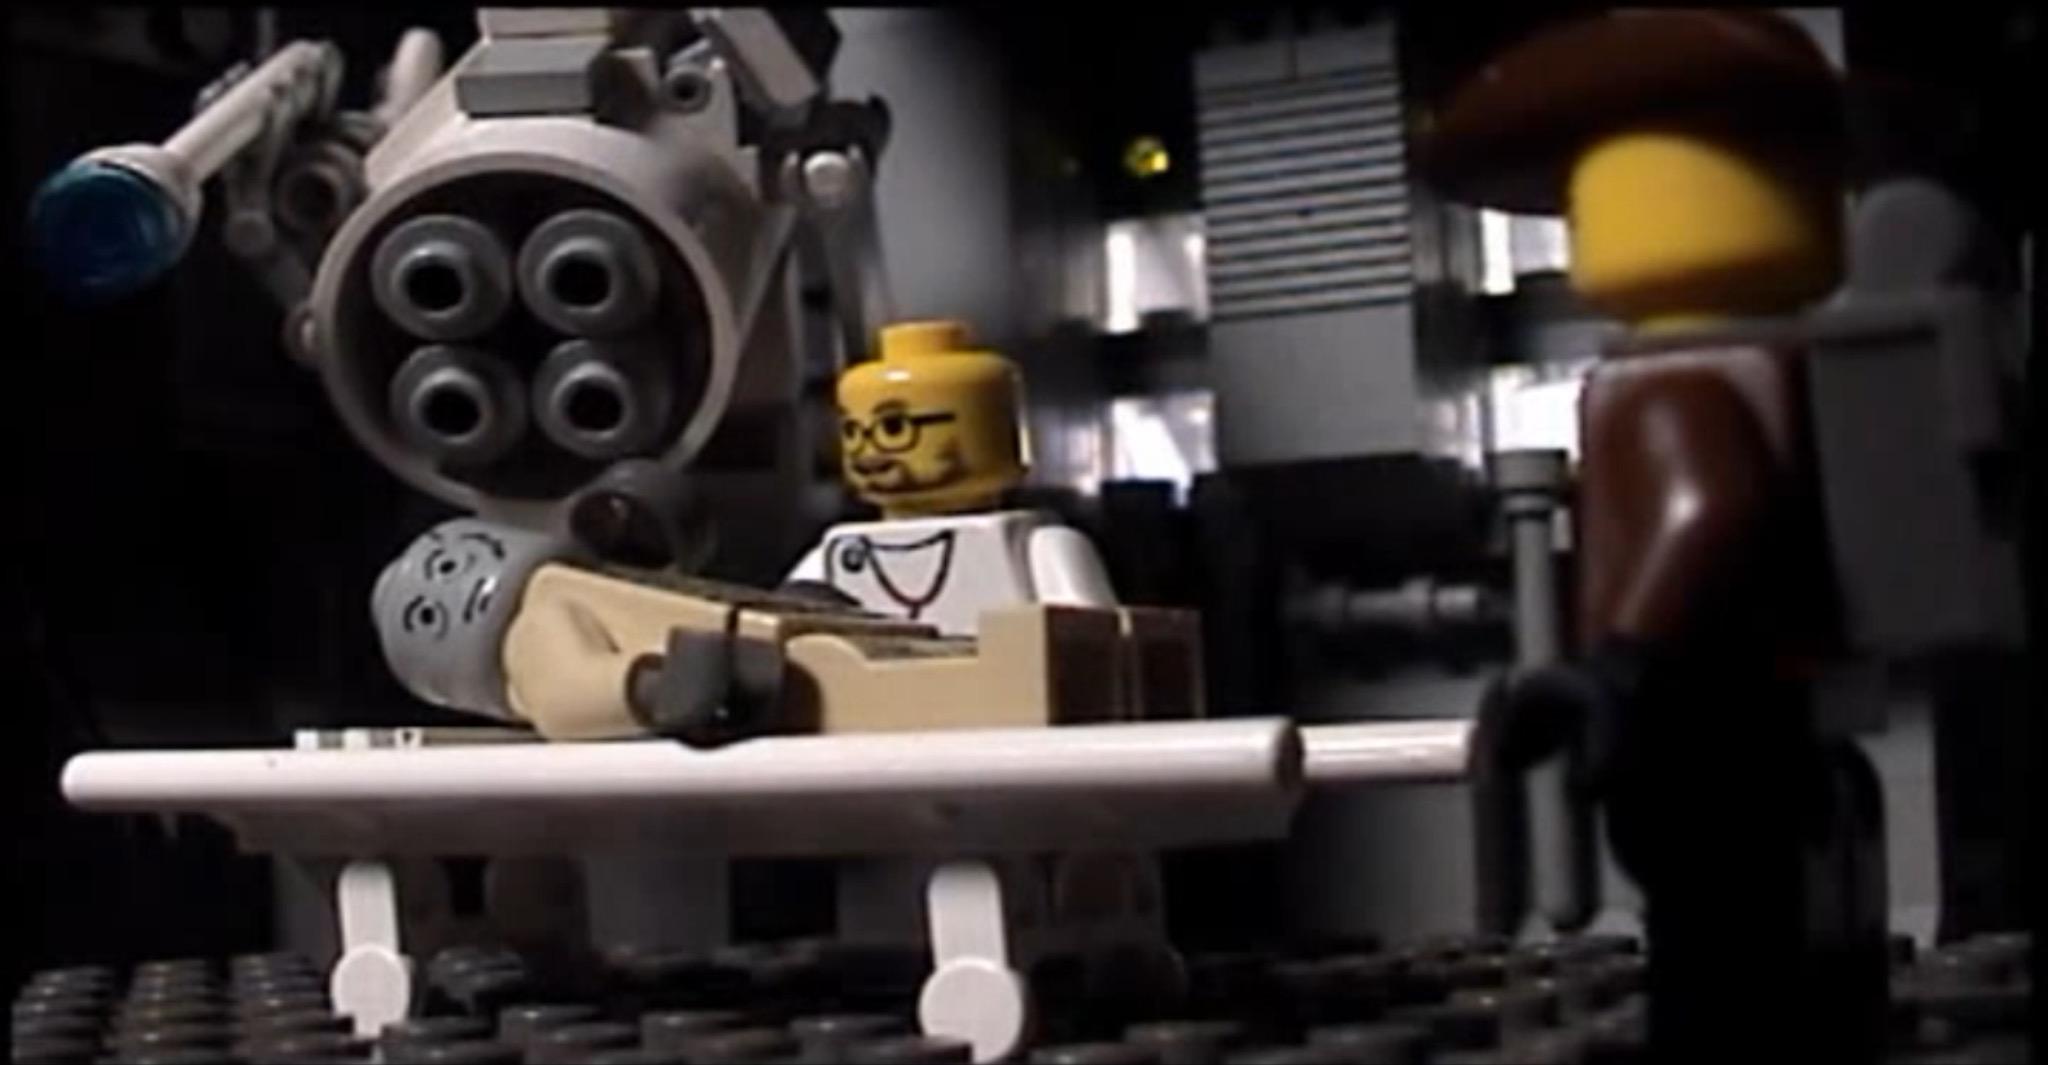 https://bricksafe.com/files/LegoSkeleton2000/brickfilm-showcase/FullSizeRender.jpg